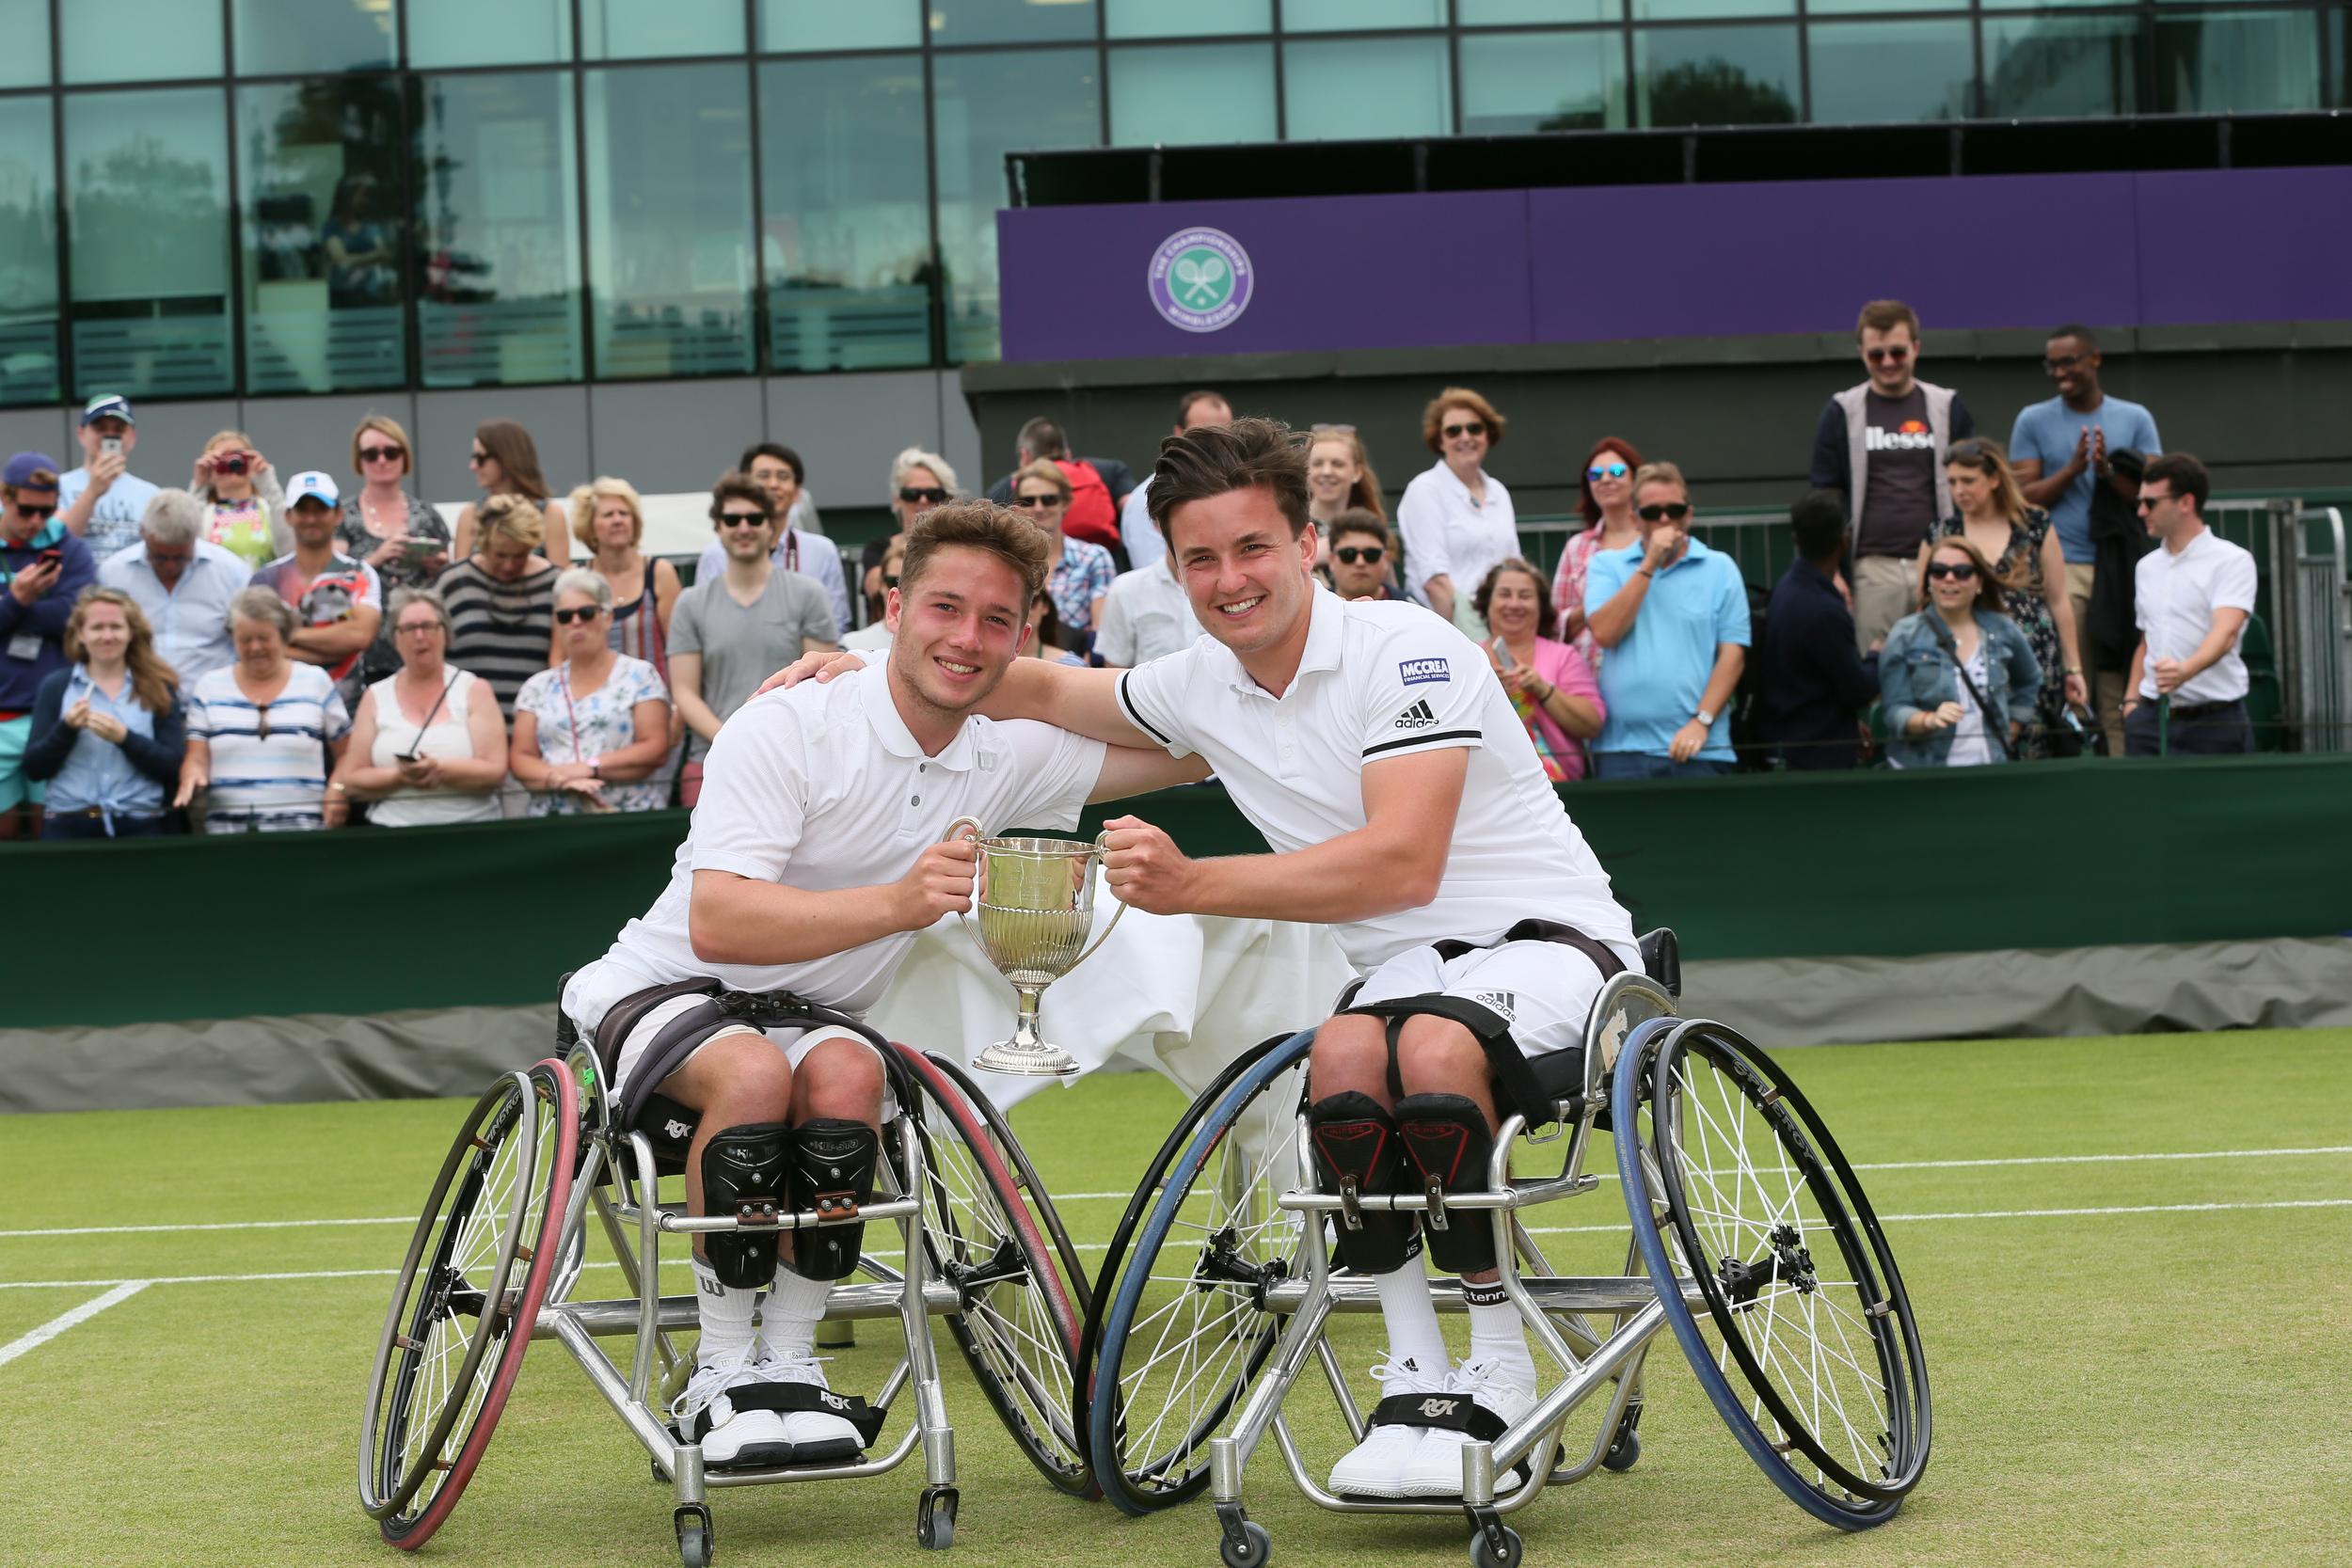 Reid and Hewett win historic Wimbledon wheelchair tennis doubles title